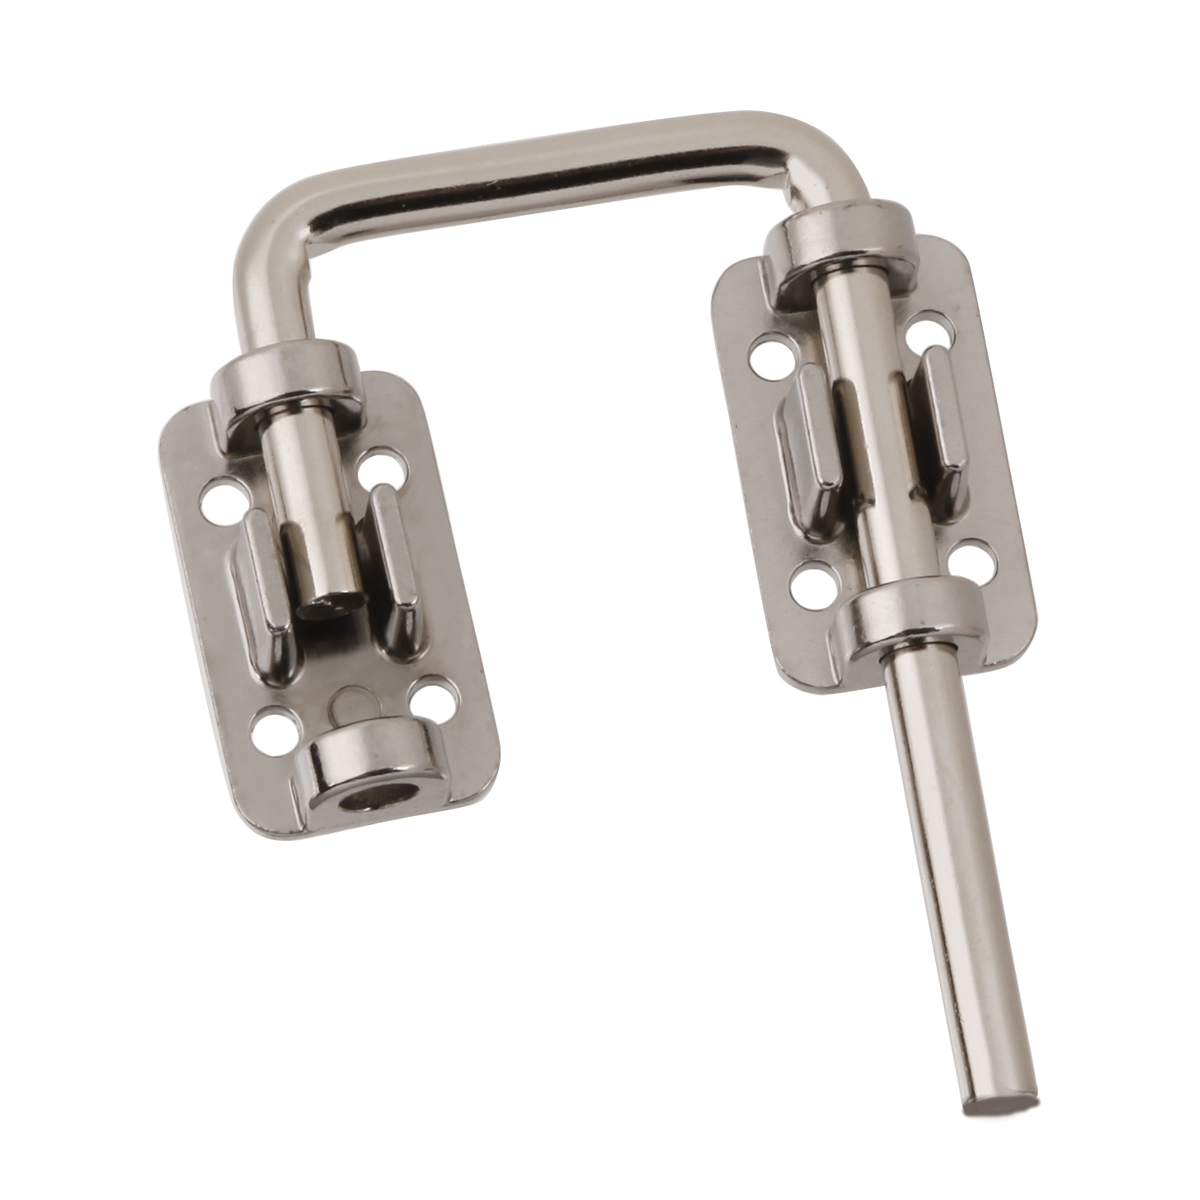 Loop Lock First Watch Security